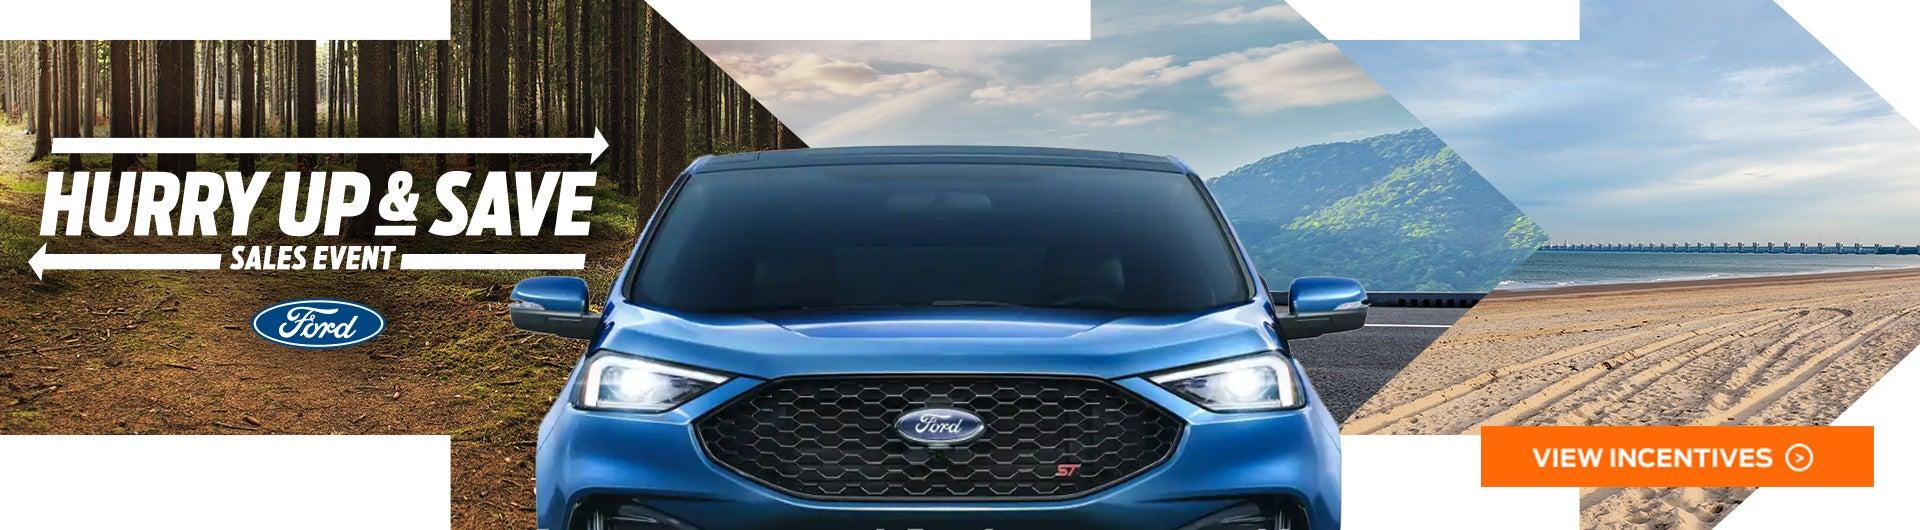 Joe Cooper Ford Edmond >> New Used Ford Dealer In Okc Near Edmond Joe Cooper Ford Of Edmond